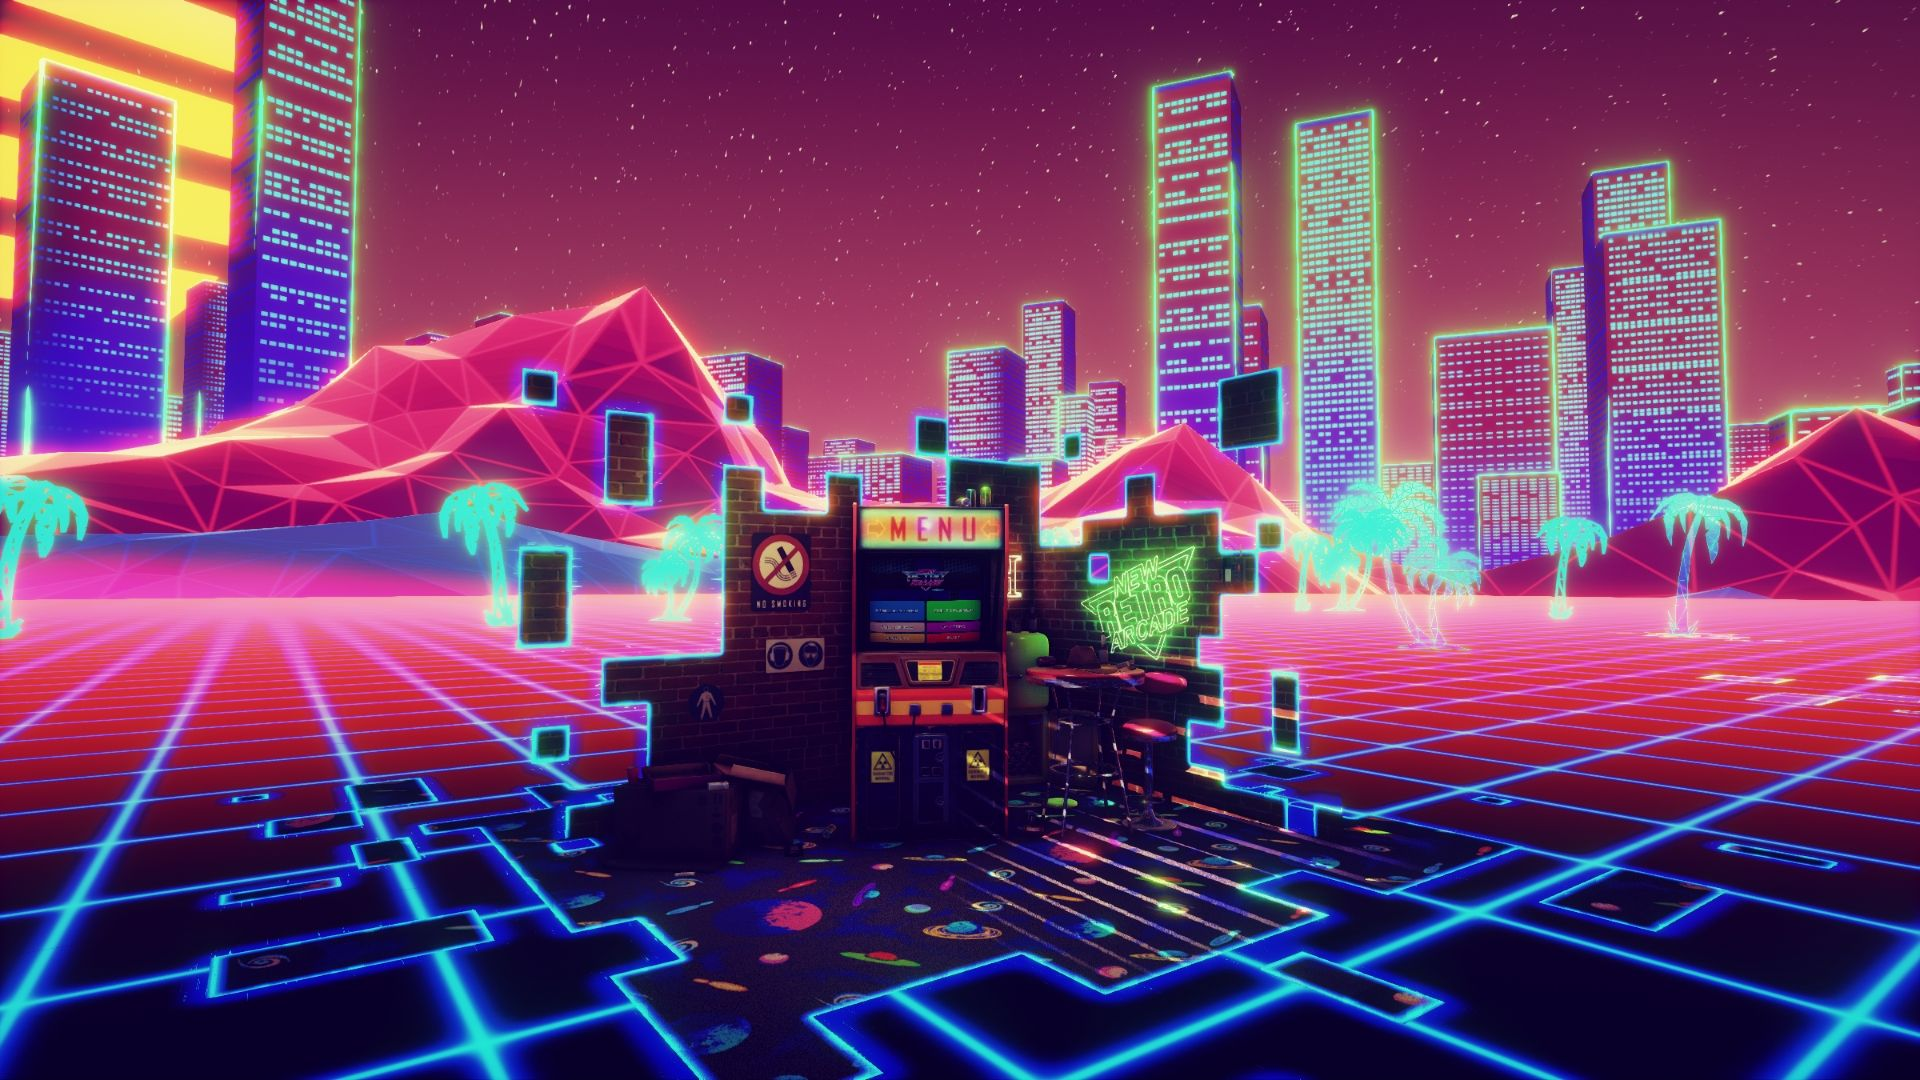 New Retro Arcade Neon PC Game Review Retro arcade